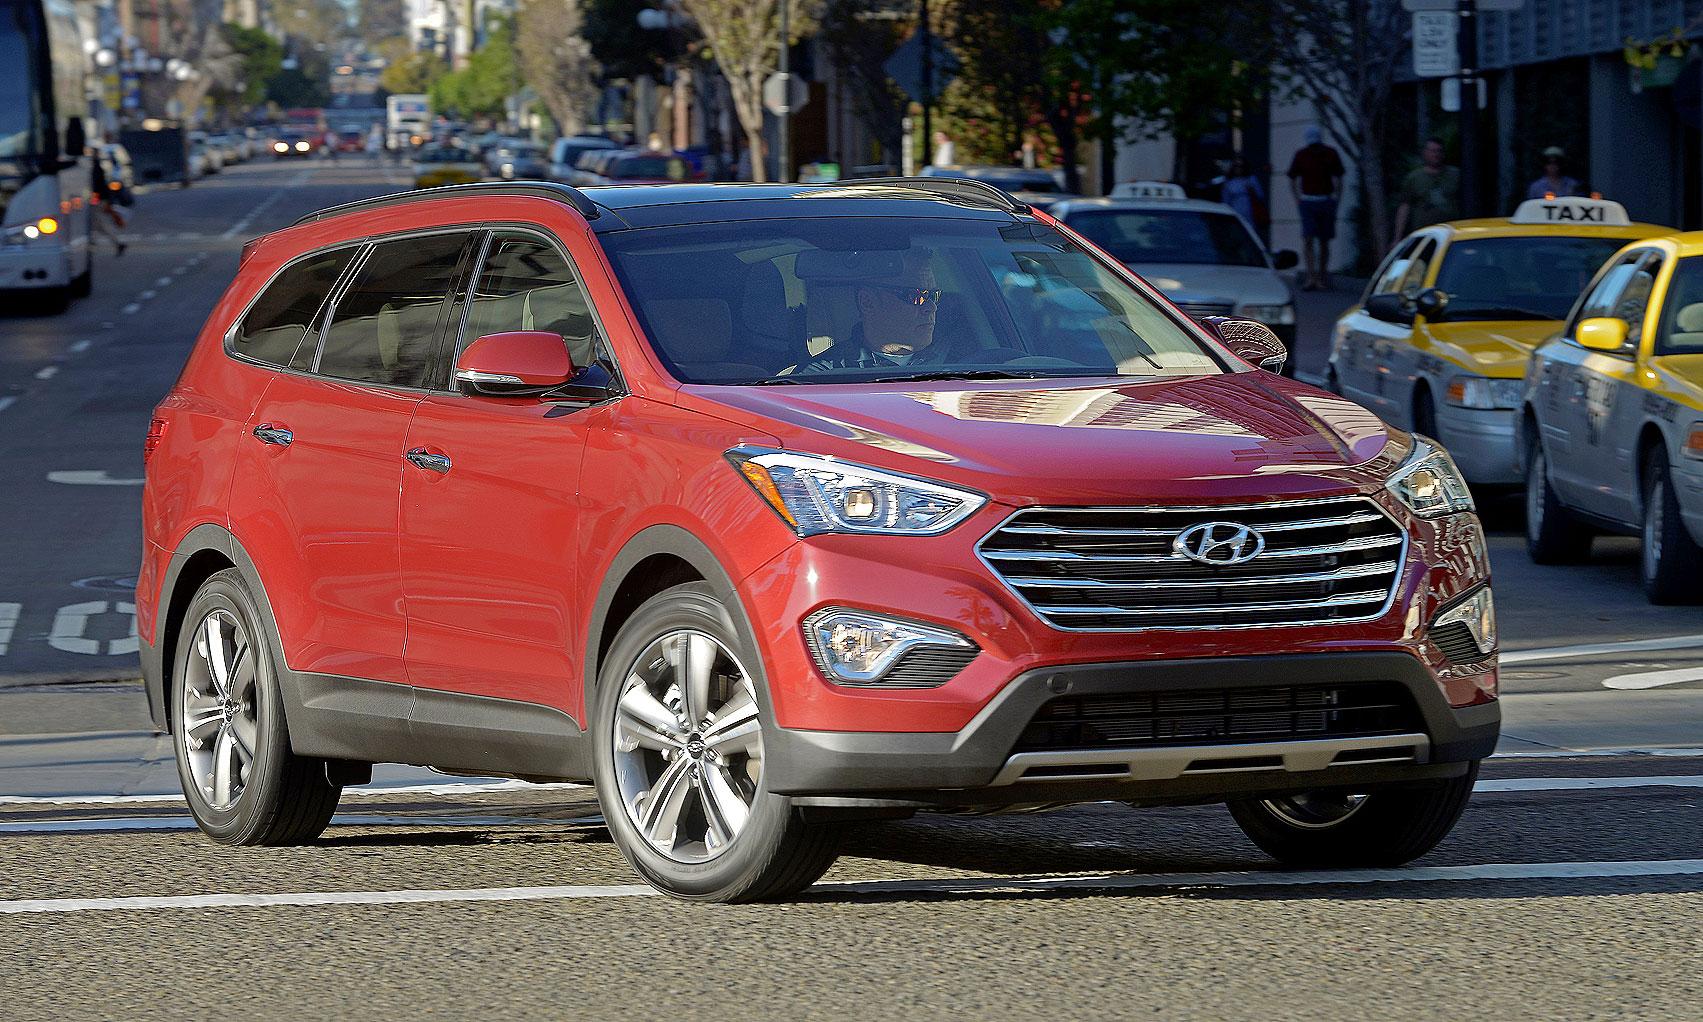 Hyundai, Kia recall nearly 1 5 million sedans, crossovers for